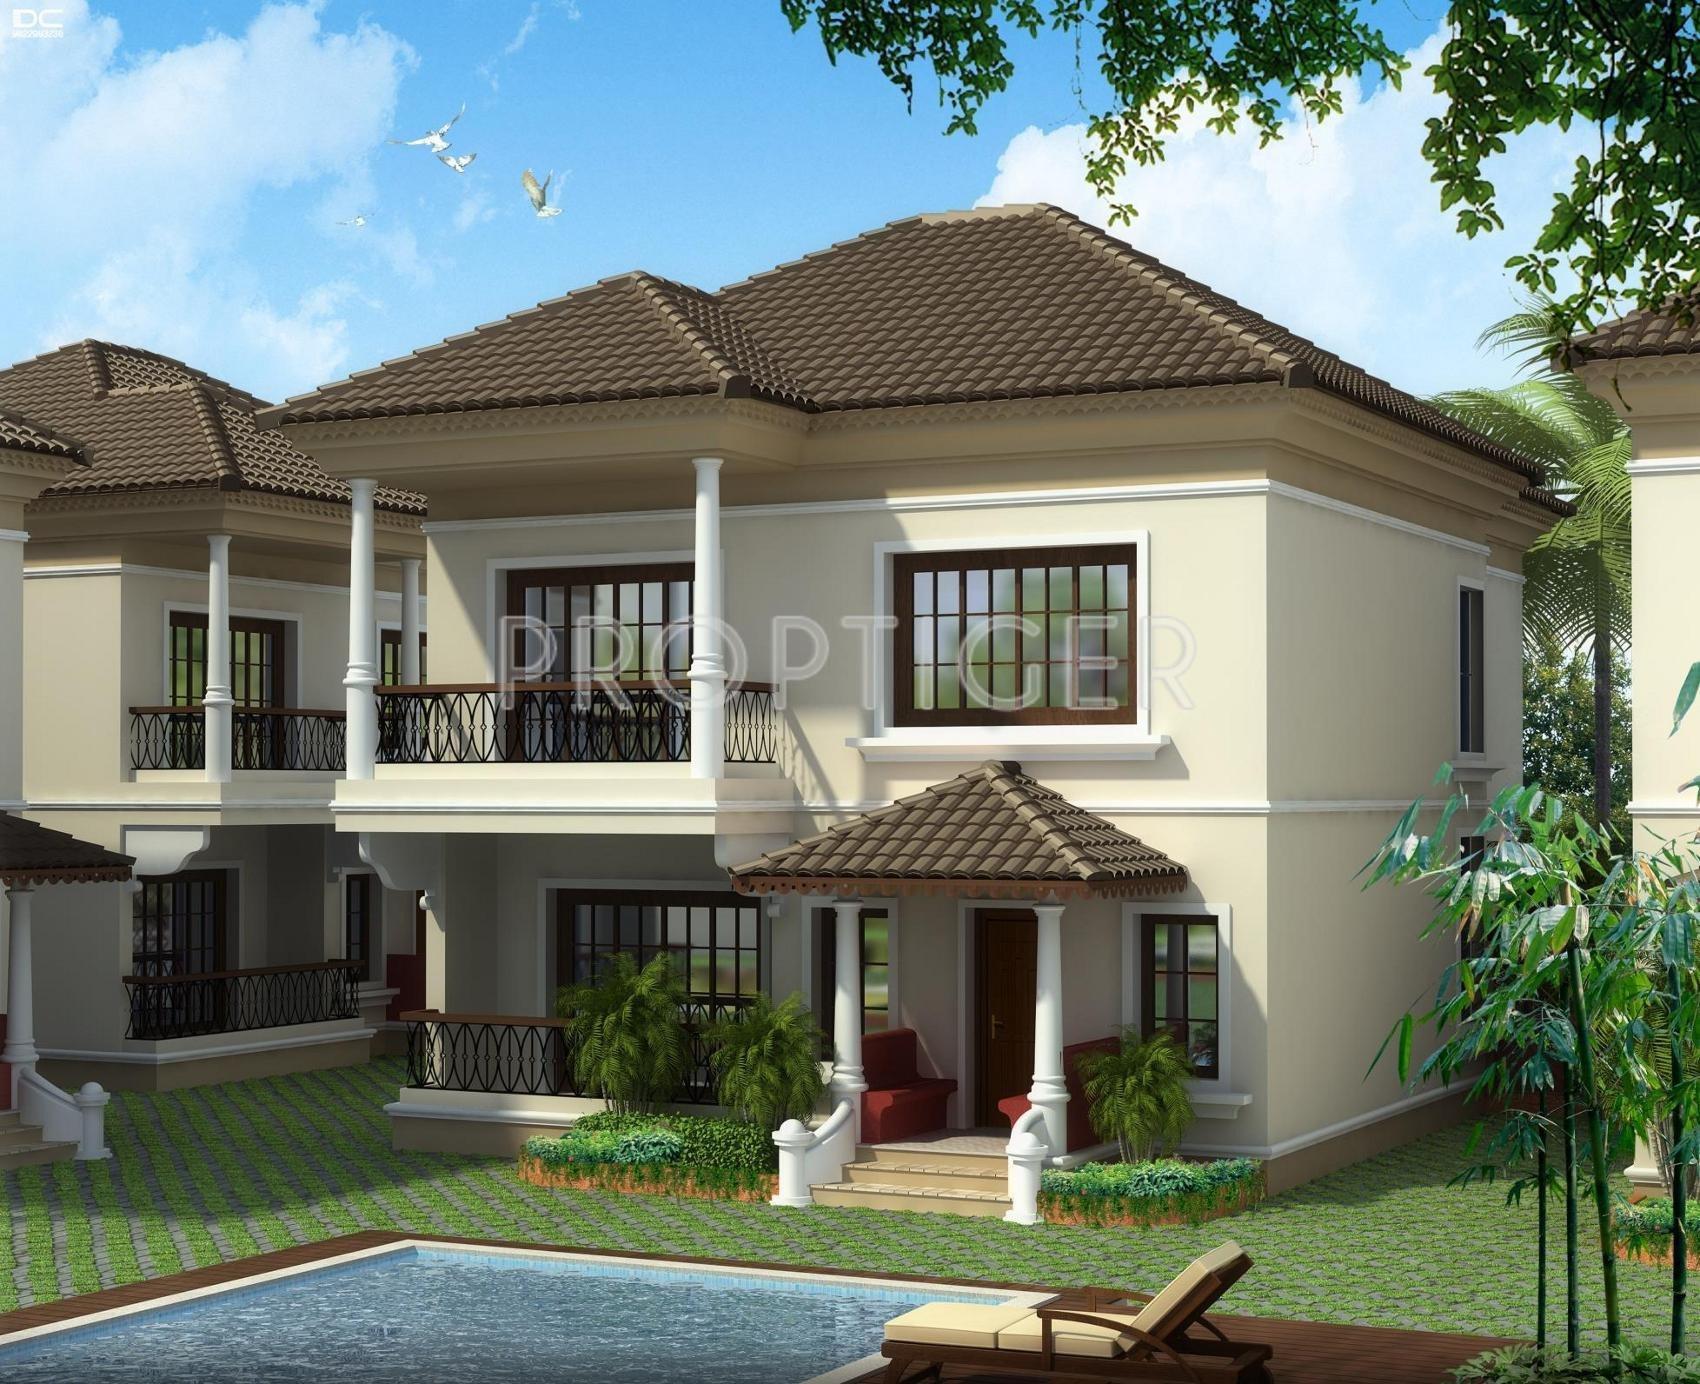 Real Estate Develpoment : Payment plan image of ashray real estate developers